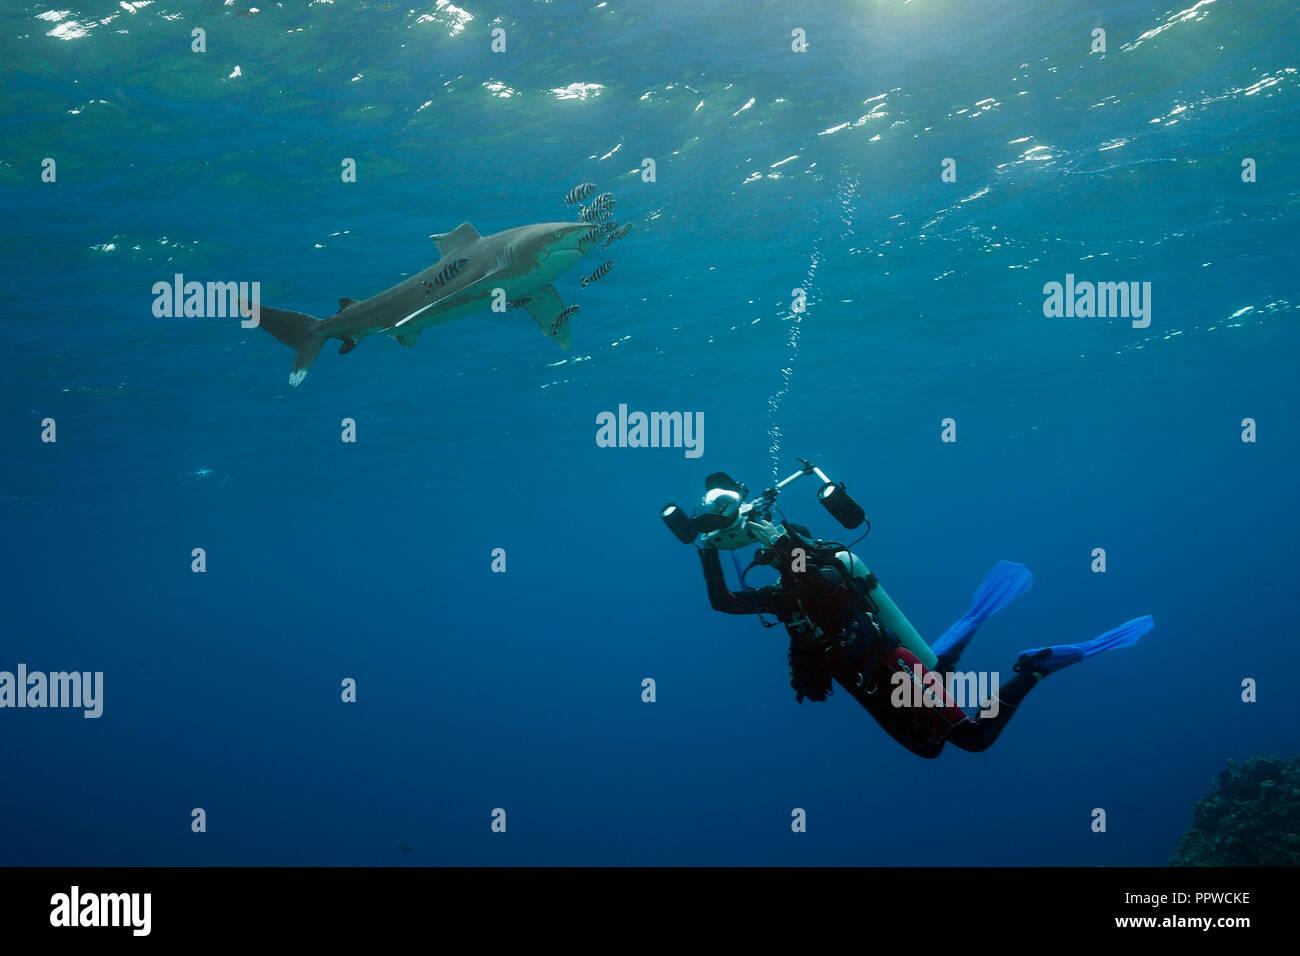 Diver taking photo of Oceanic Whitetip Shark, Carcharhinus longimanus, Brother Islands, Red Sea, Egypt Stock Photo